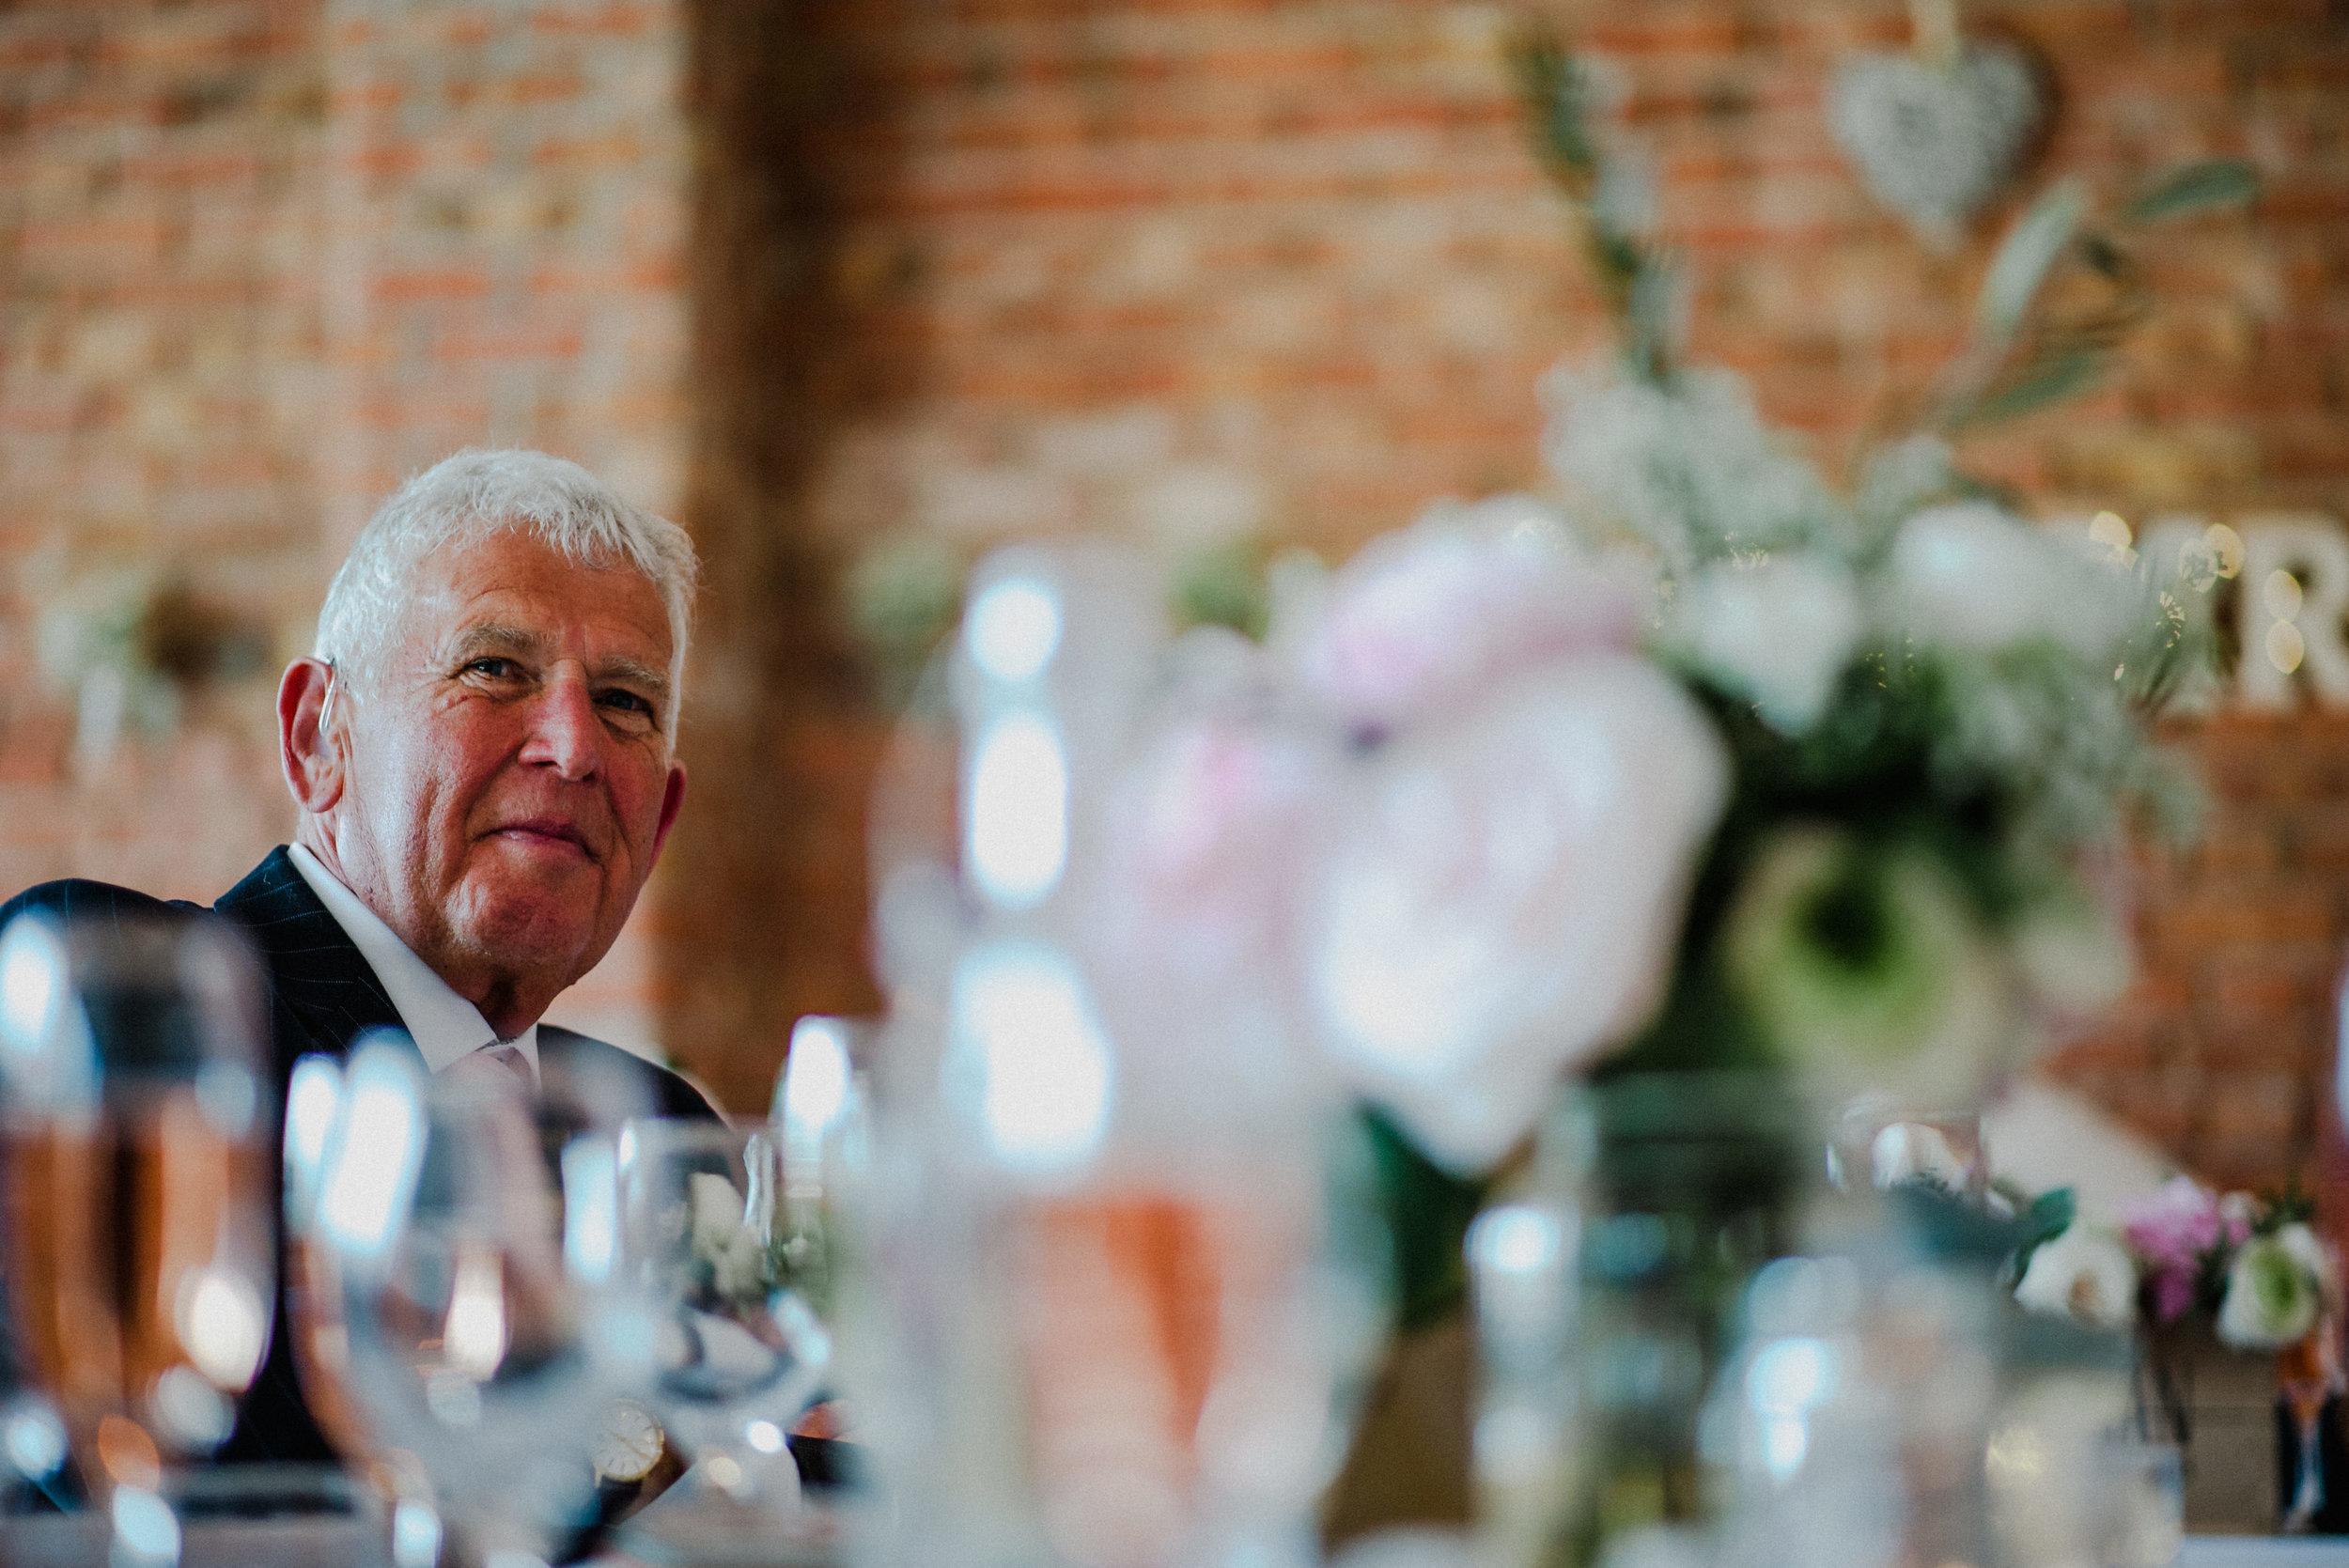 the-green-cornwall-wedding-photographer-31.jpg